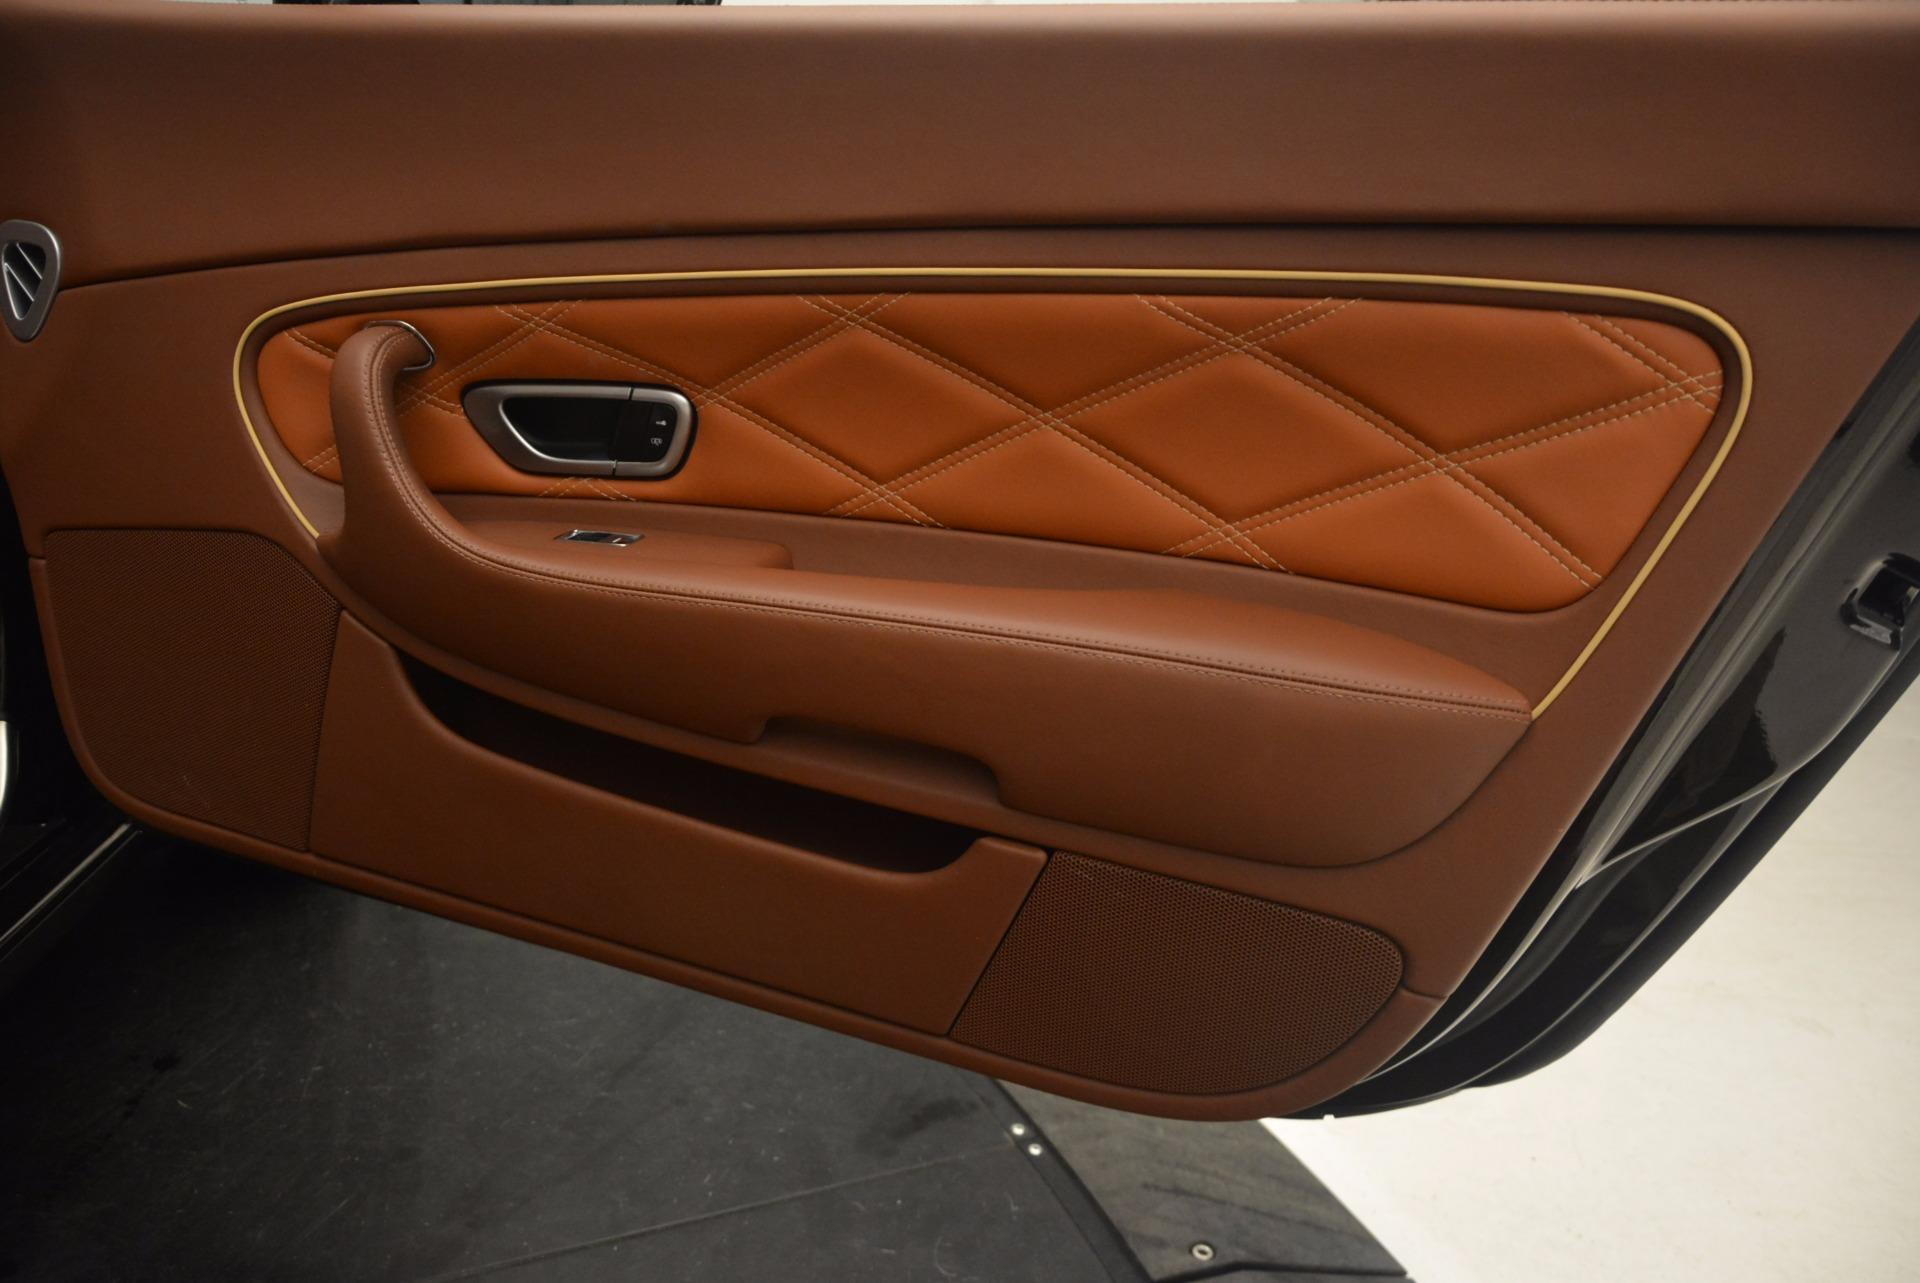 Used 2010 Bentley Continental GT Series 51 For Sale In Westport, CT 1222_p40